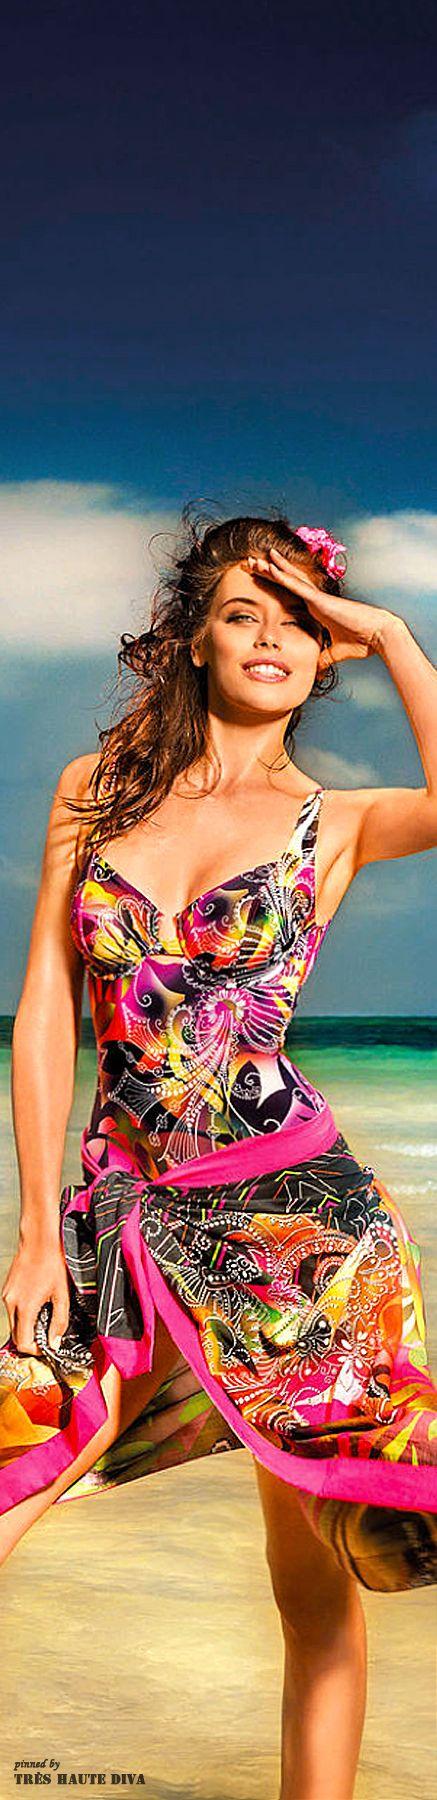 .High Society- Resort Beach wear- | ~LadyLuxuryDesigns